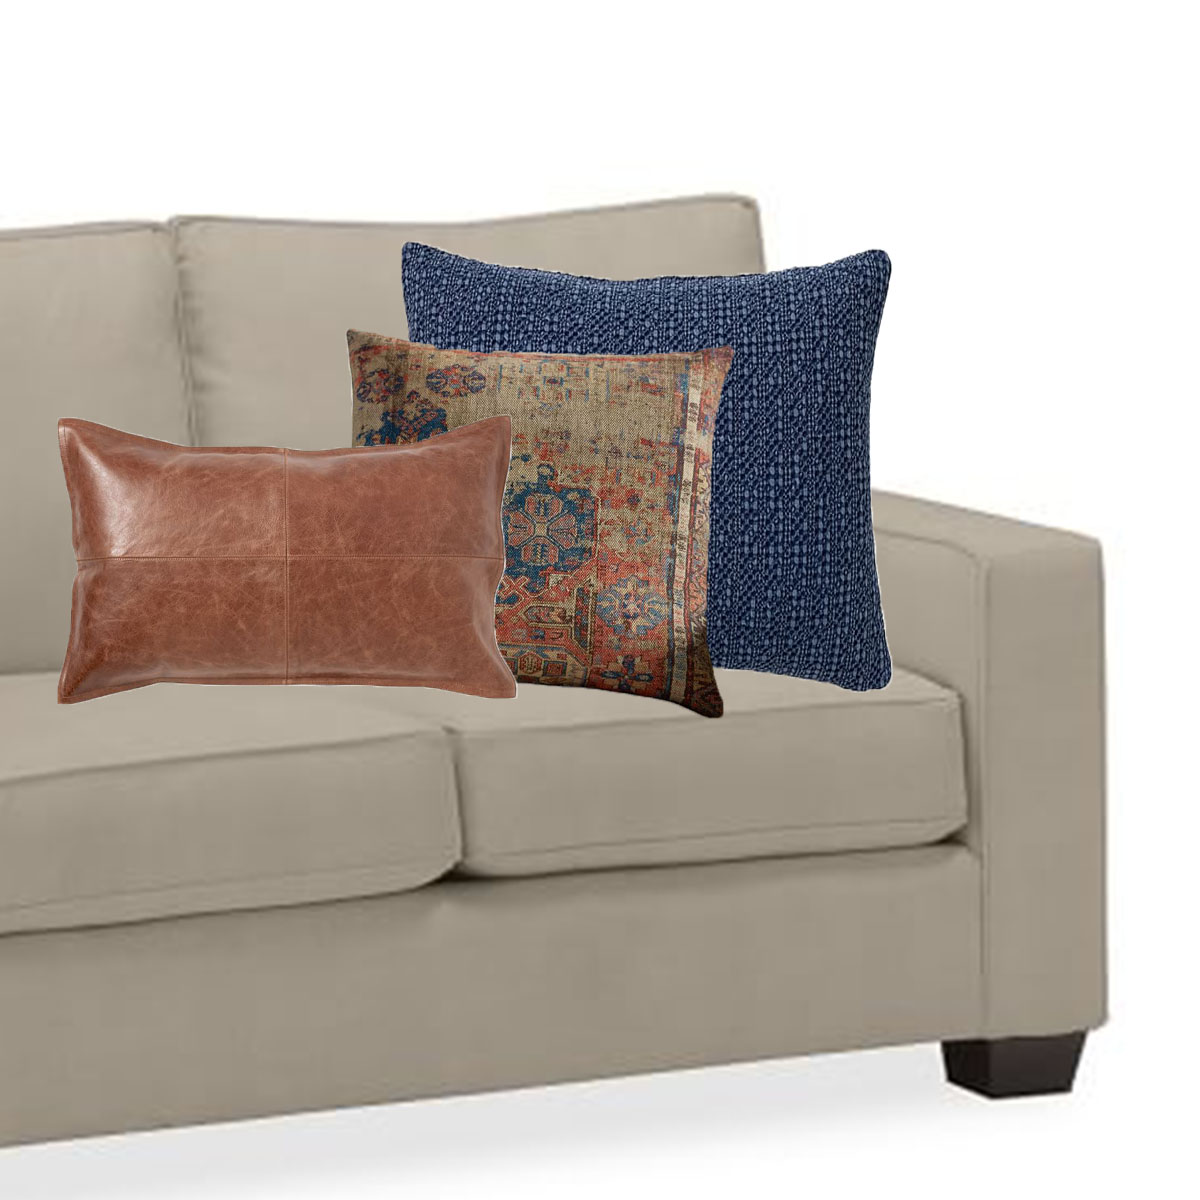 View Larger Image Coordinate Sofa Pillows For Gray Sofa